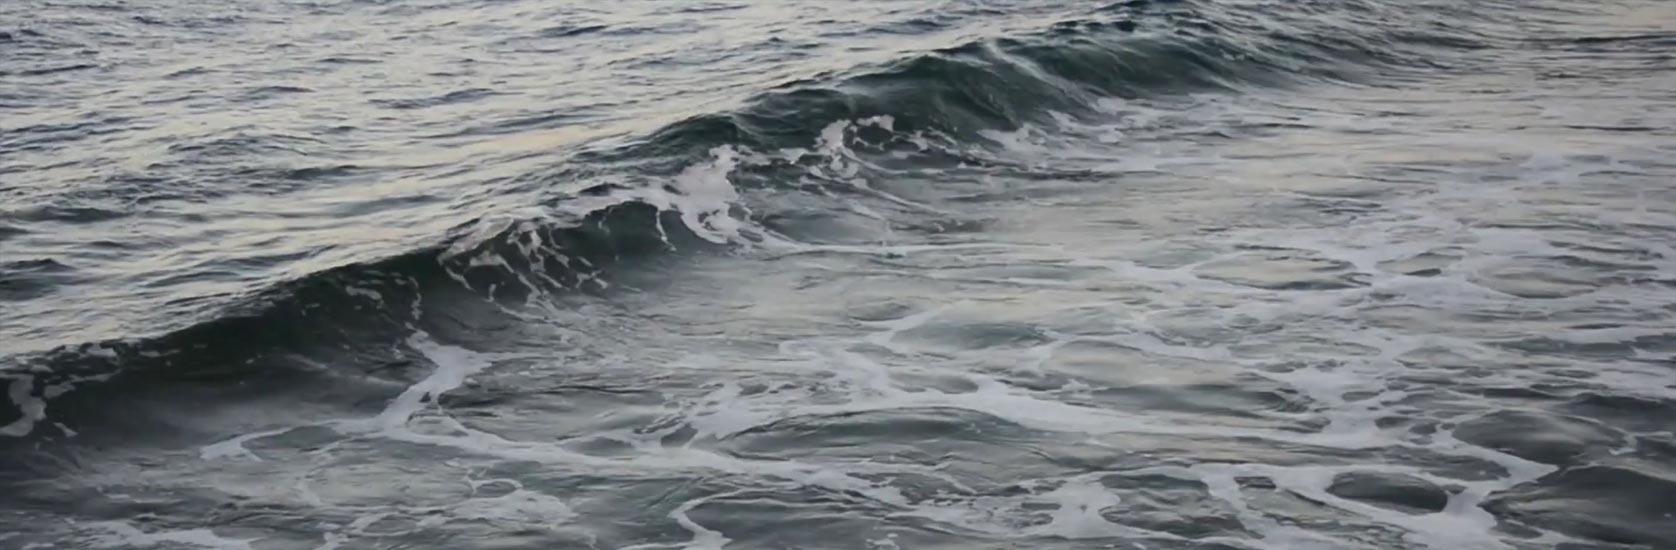 add-the-sea-wave